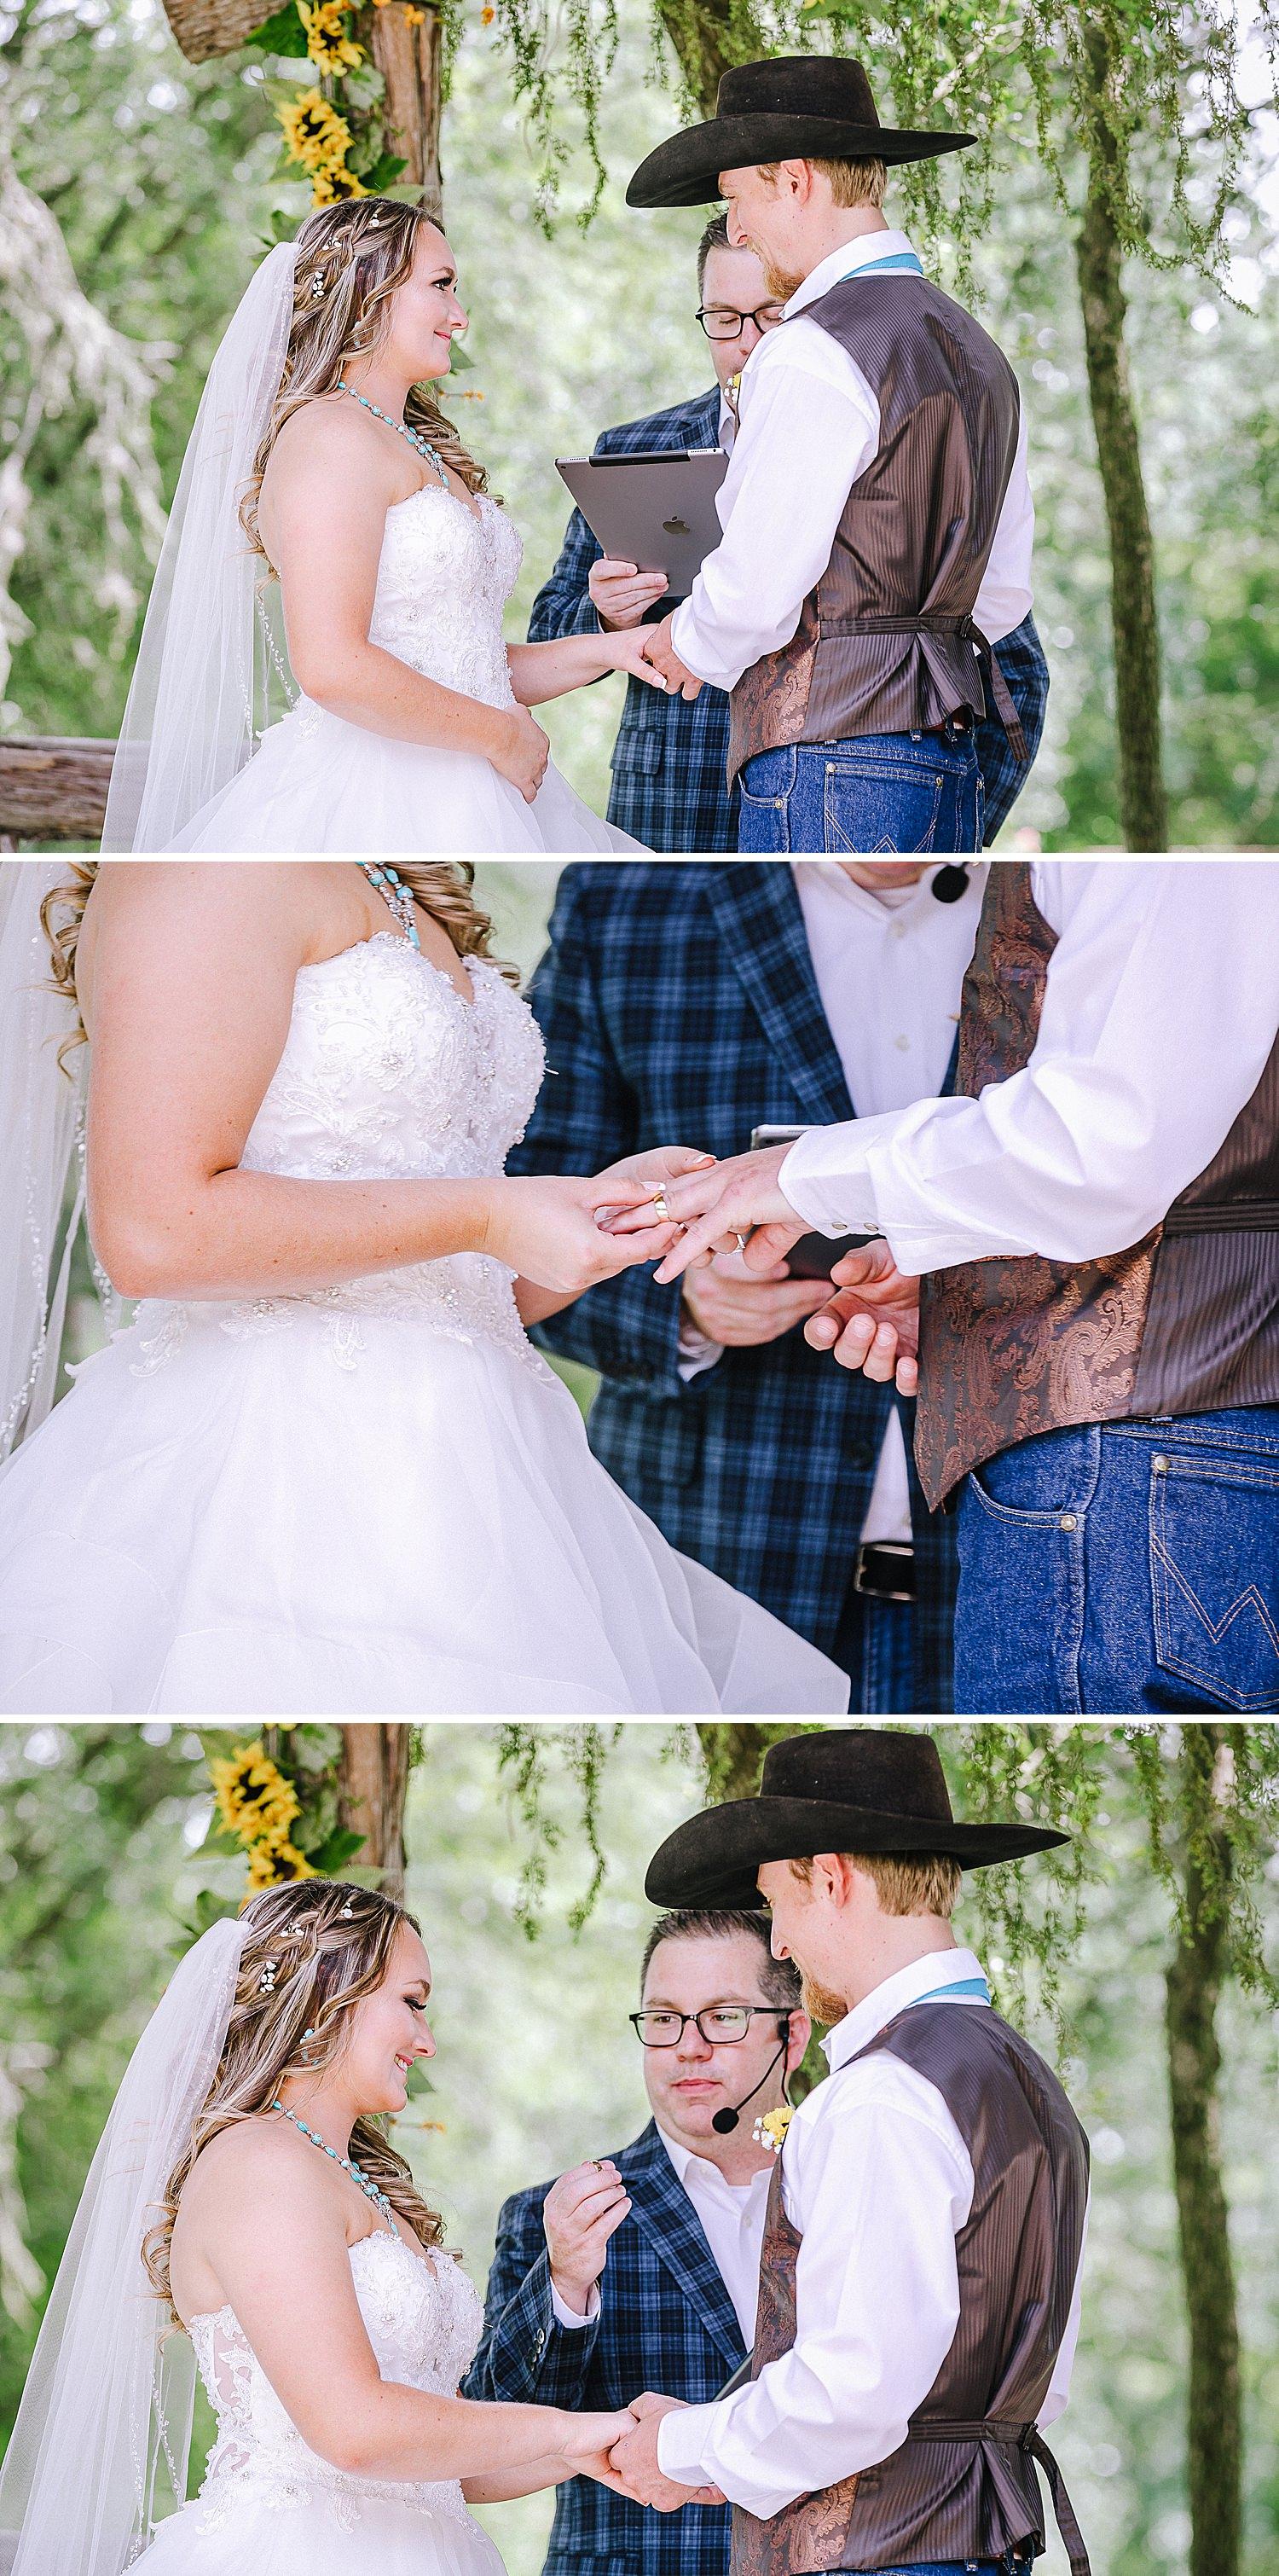 Carly-Barton-Photography-Old-Town-Texas-Rustic-Wedding-Photos-Sunflowers-Boots-Kyle-Texas_0042.jpg